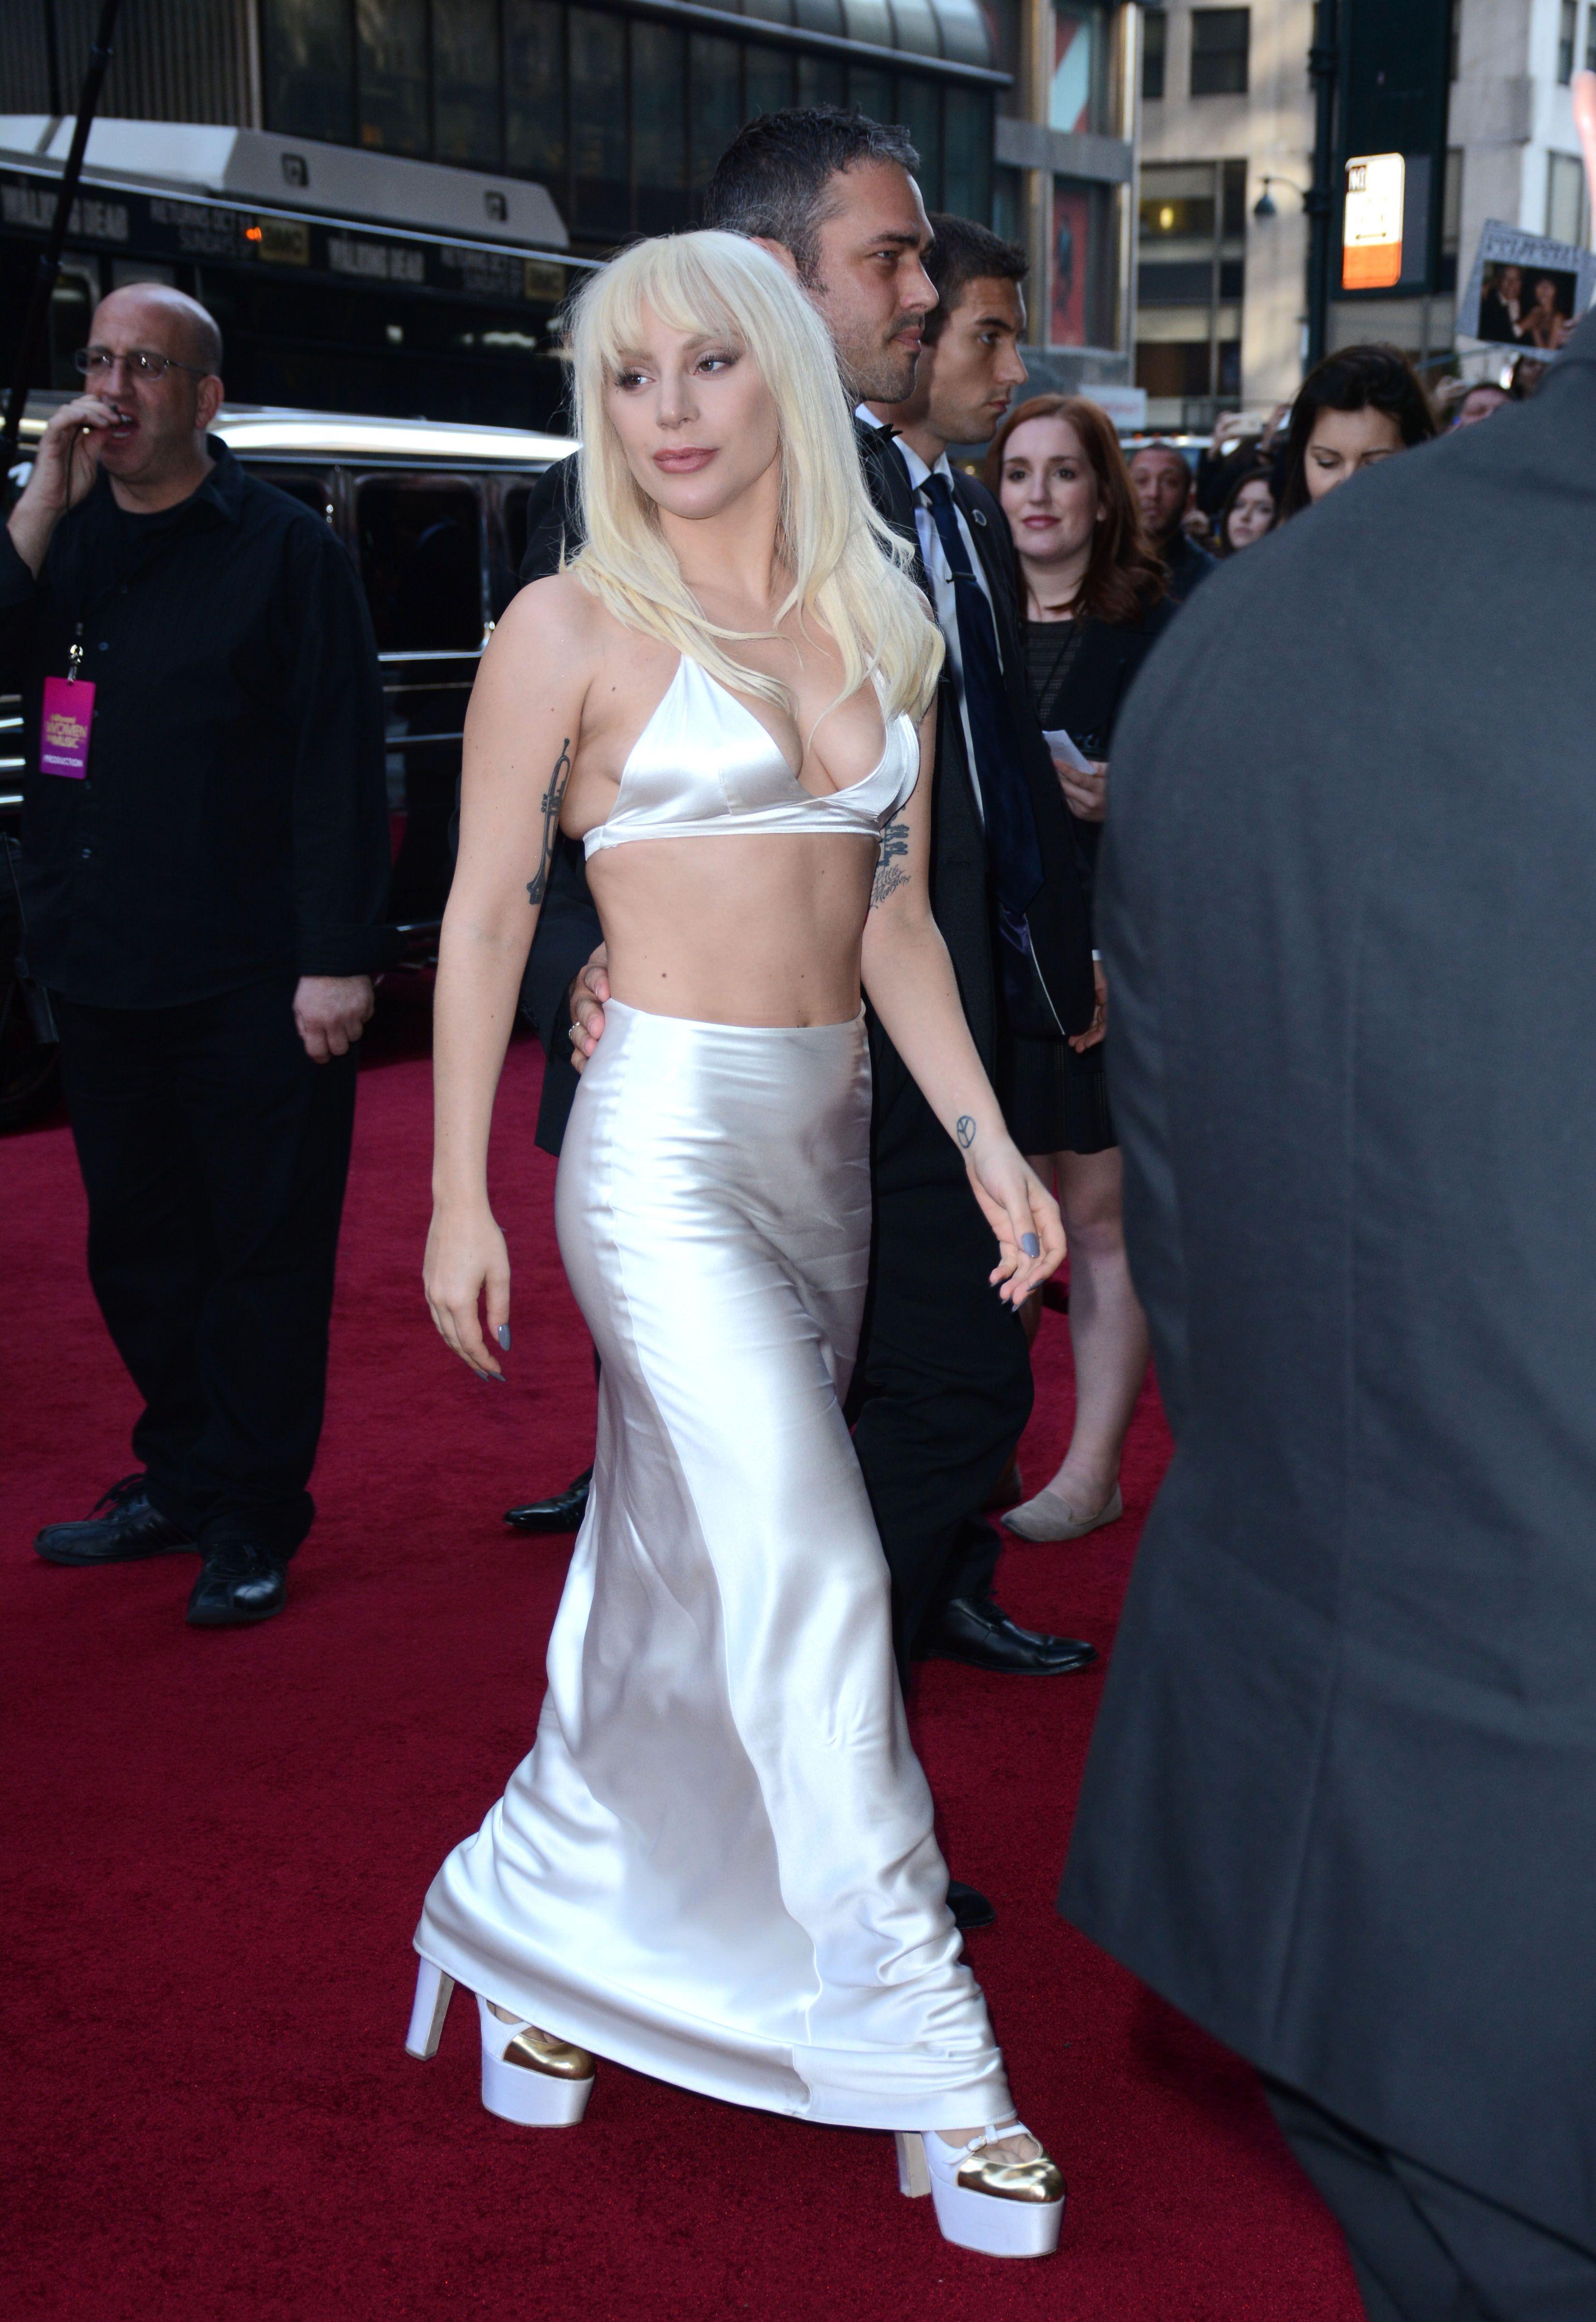 Lady-Gaga-Cleavage-3